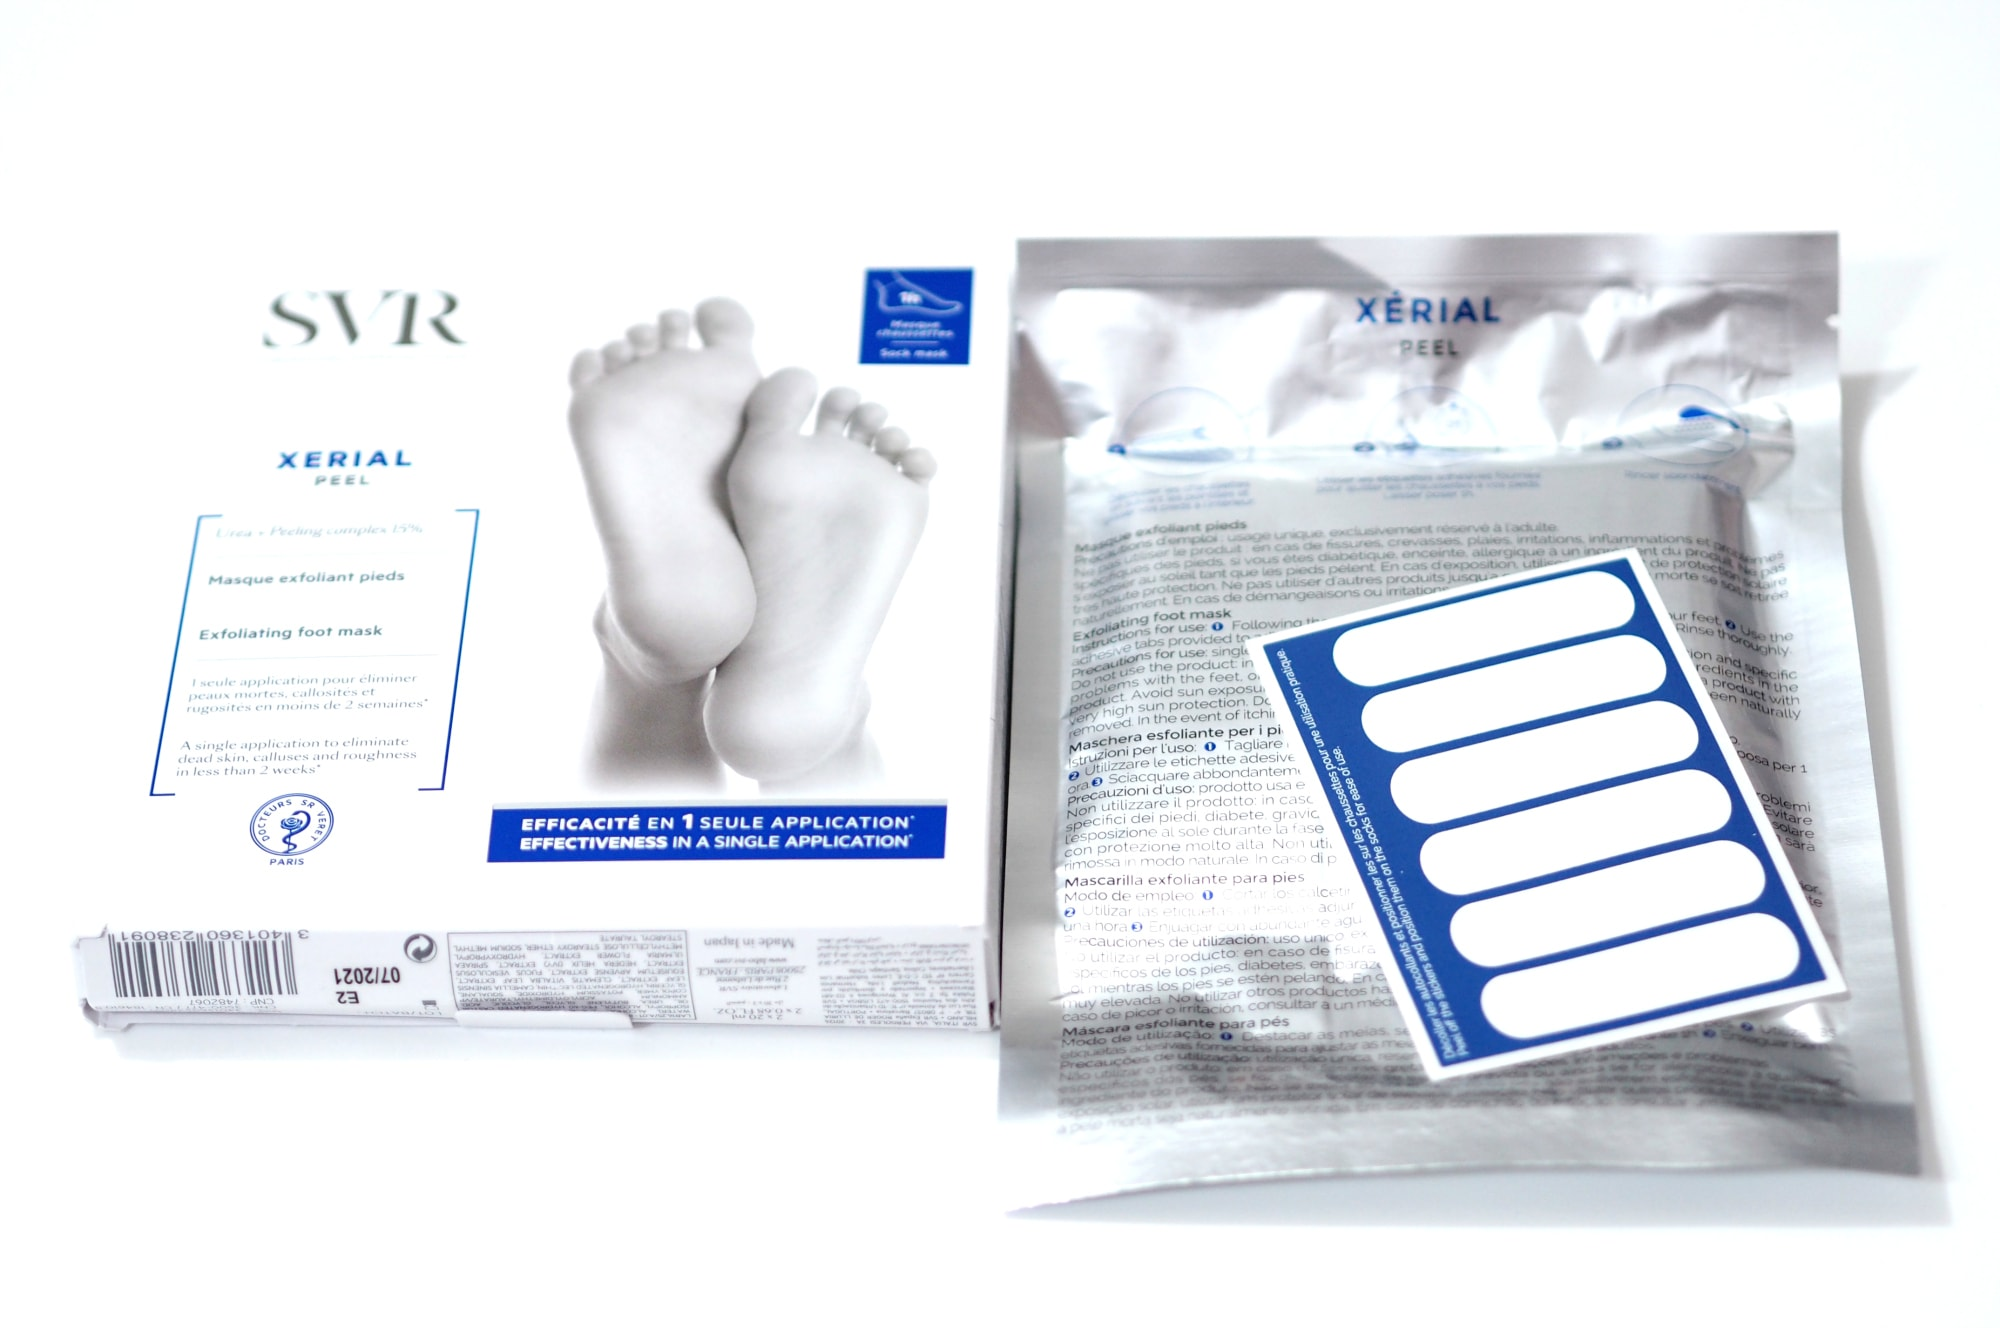 SVR Xerial Footcare   Foot Peel and Foot Cream